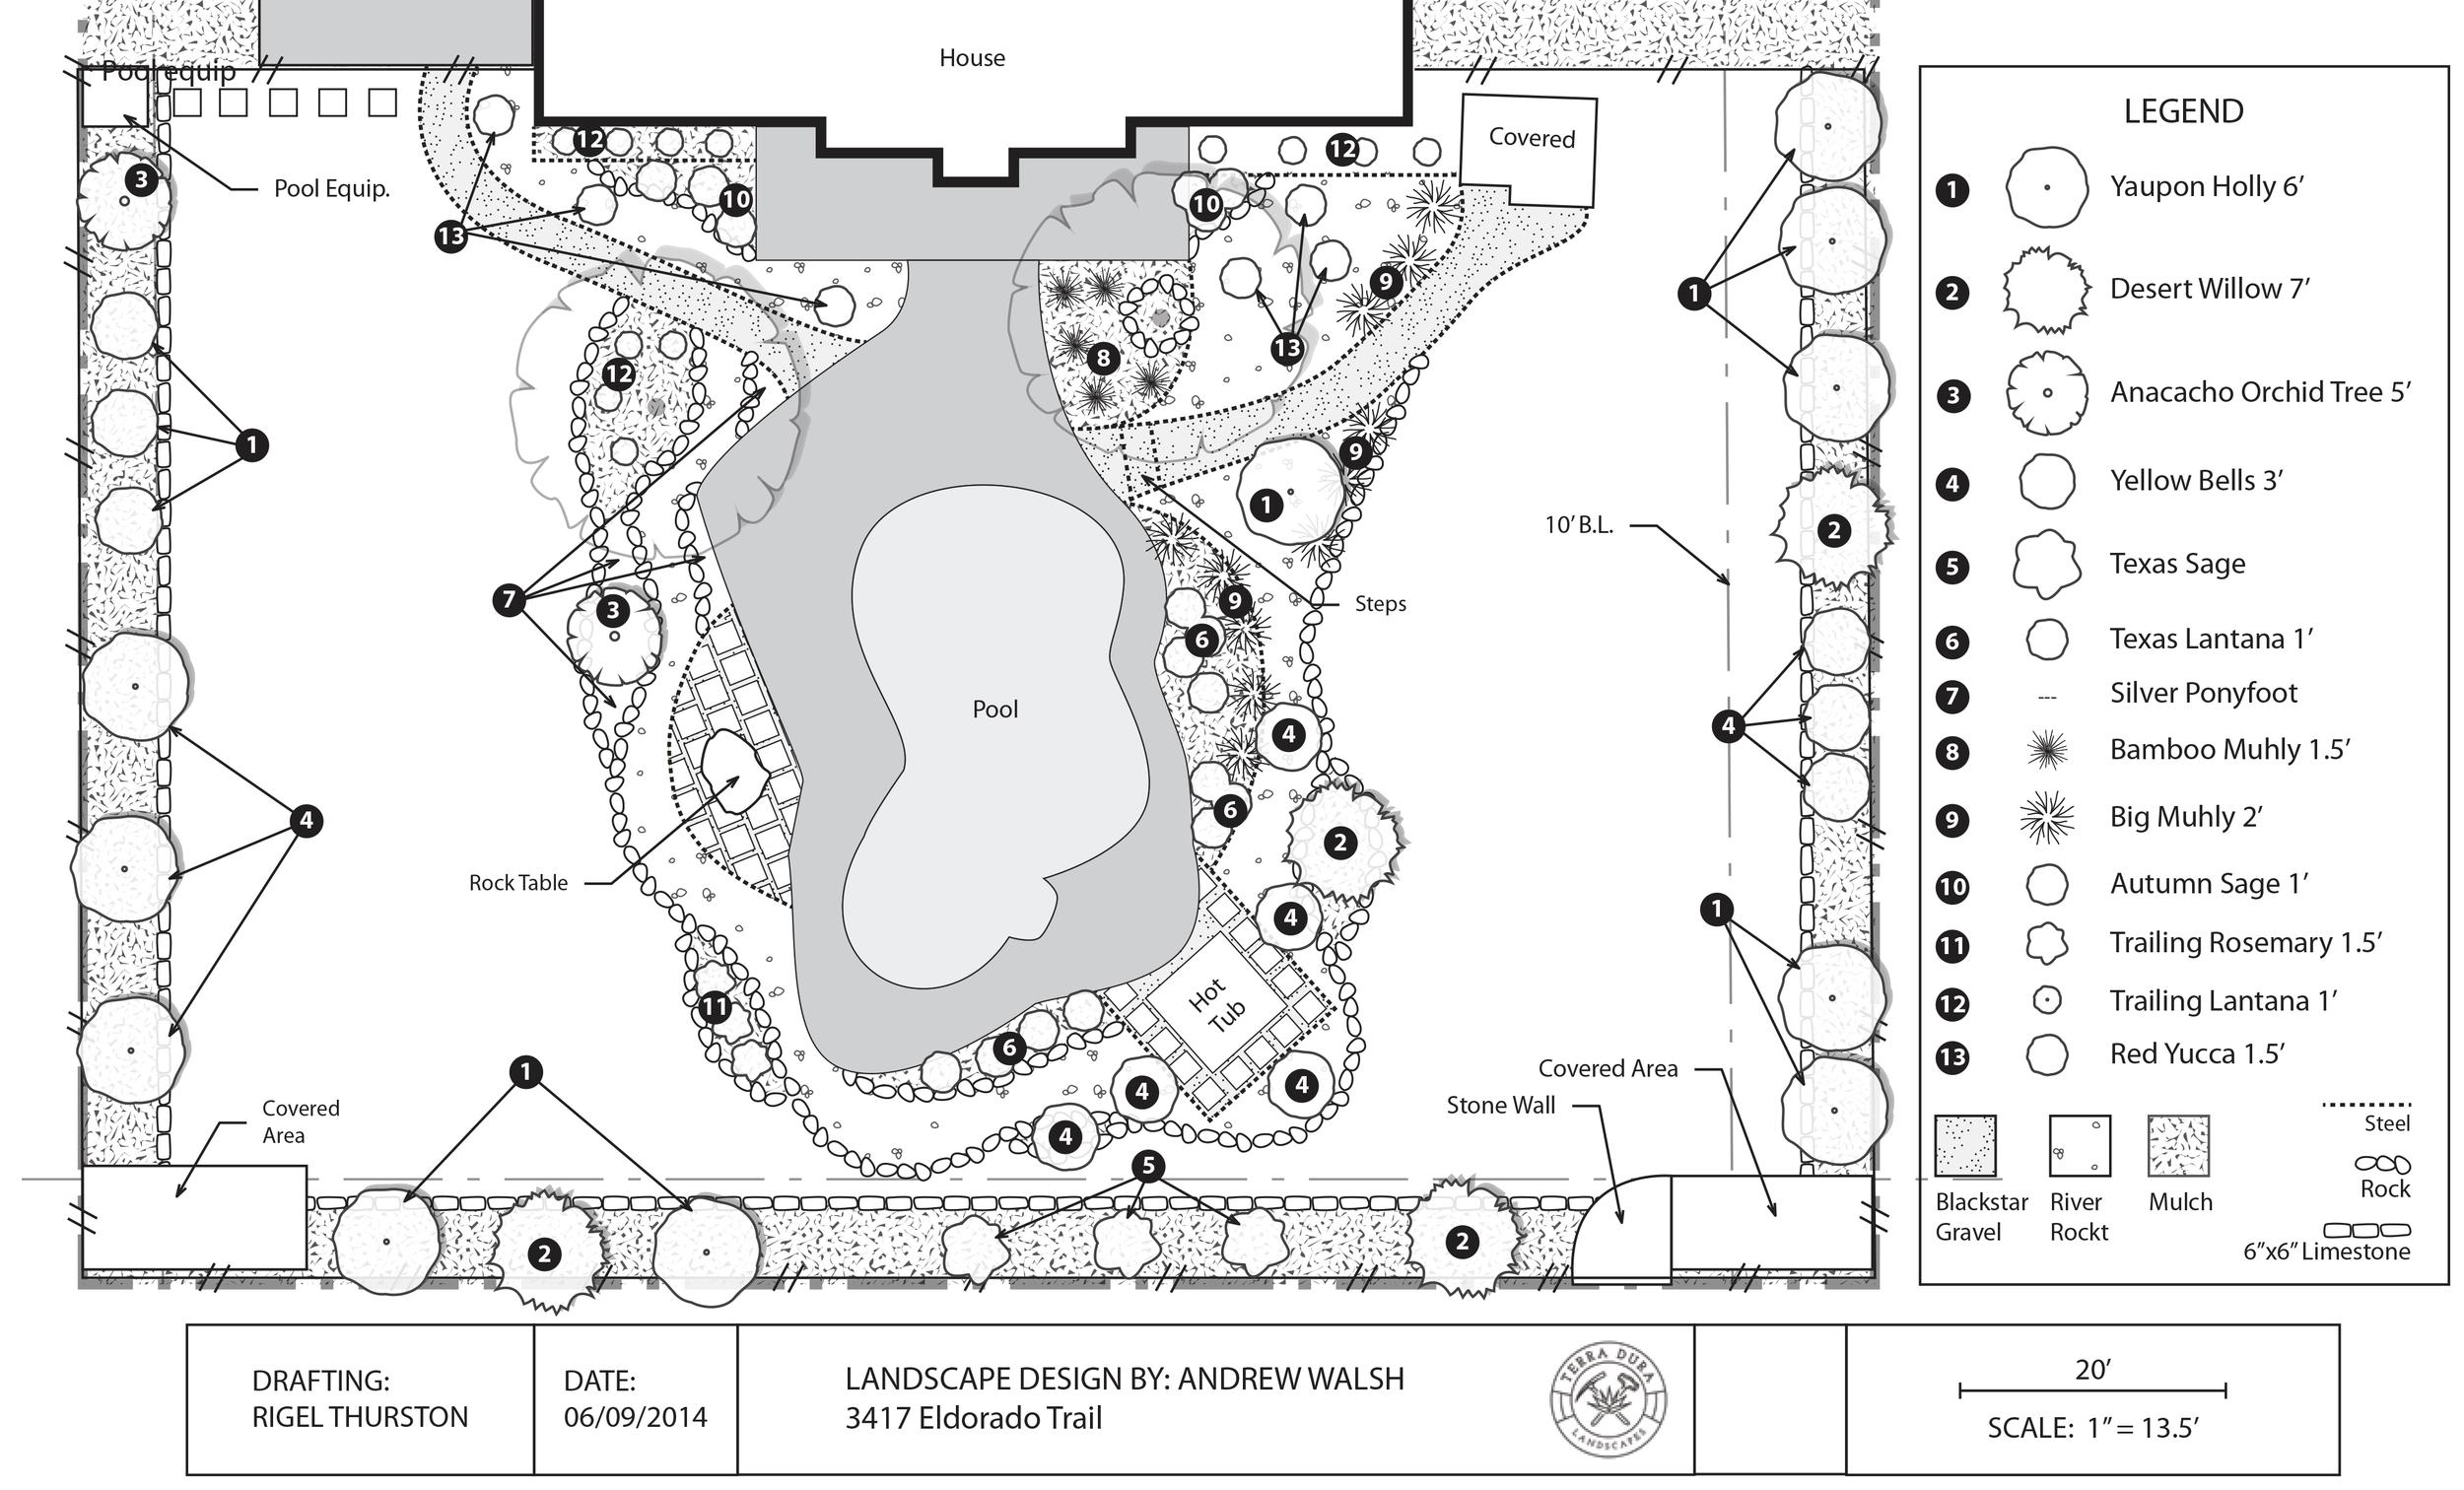 2014-06-09 Design 3417 Eldorado Trail.jpg